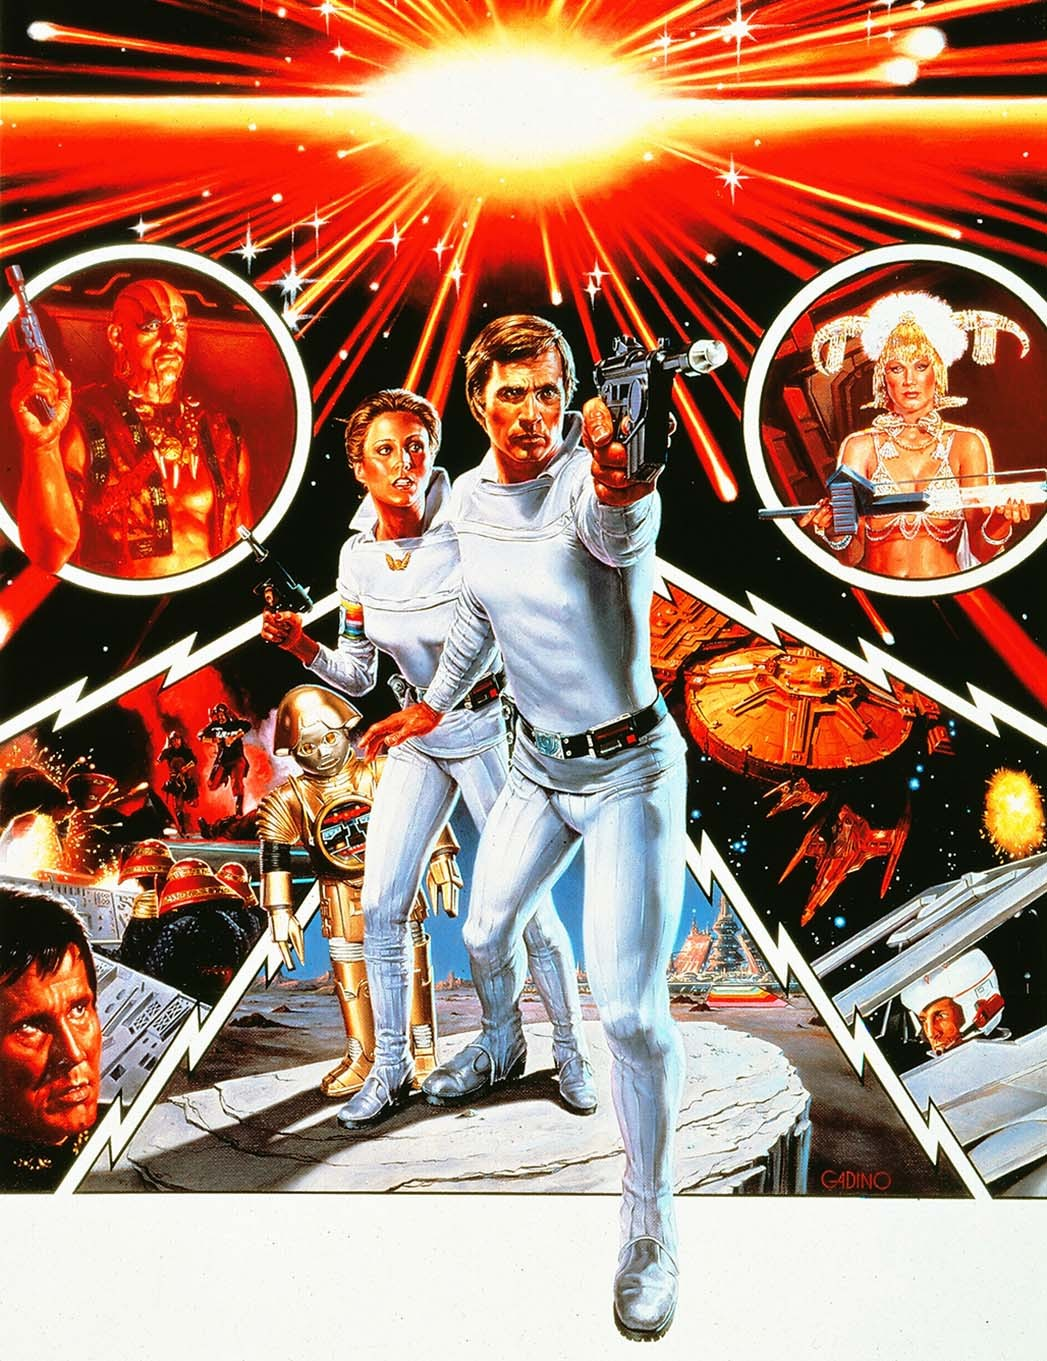 'Buck Rogers': Skydance Developing Competing Movie Based on Pulp Hero